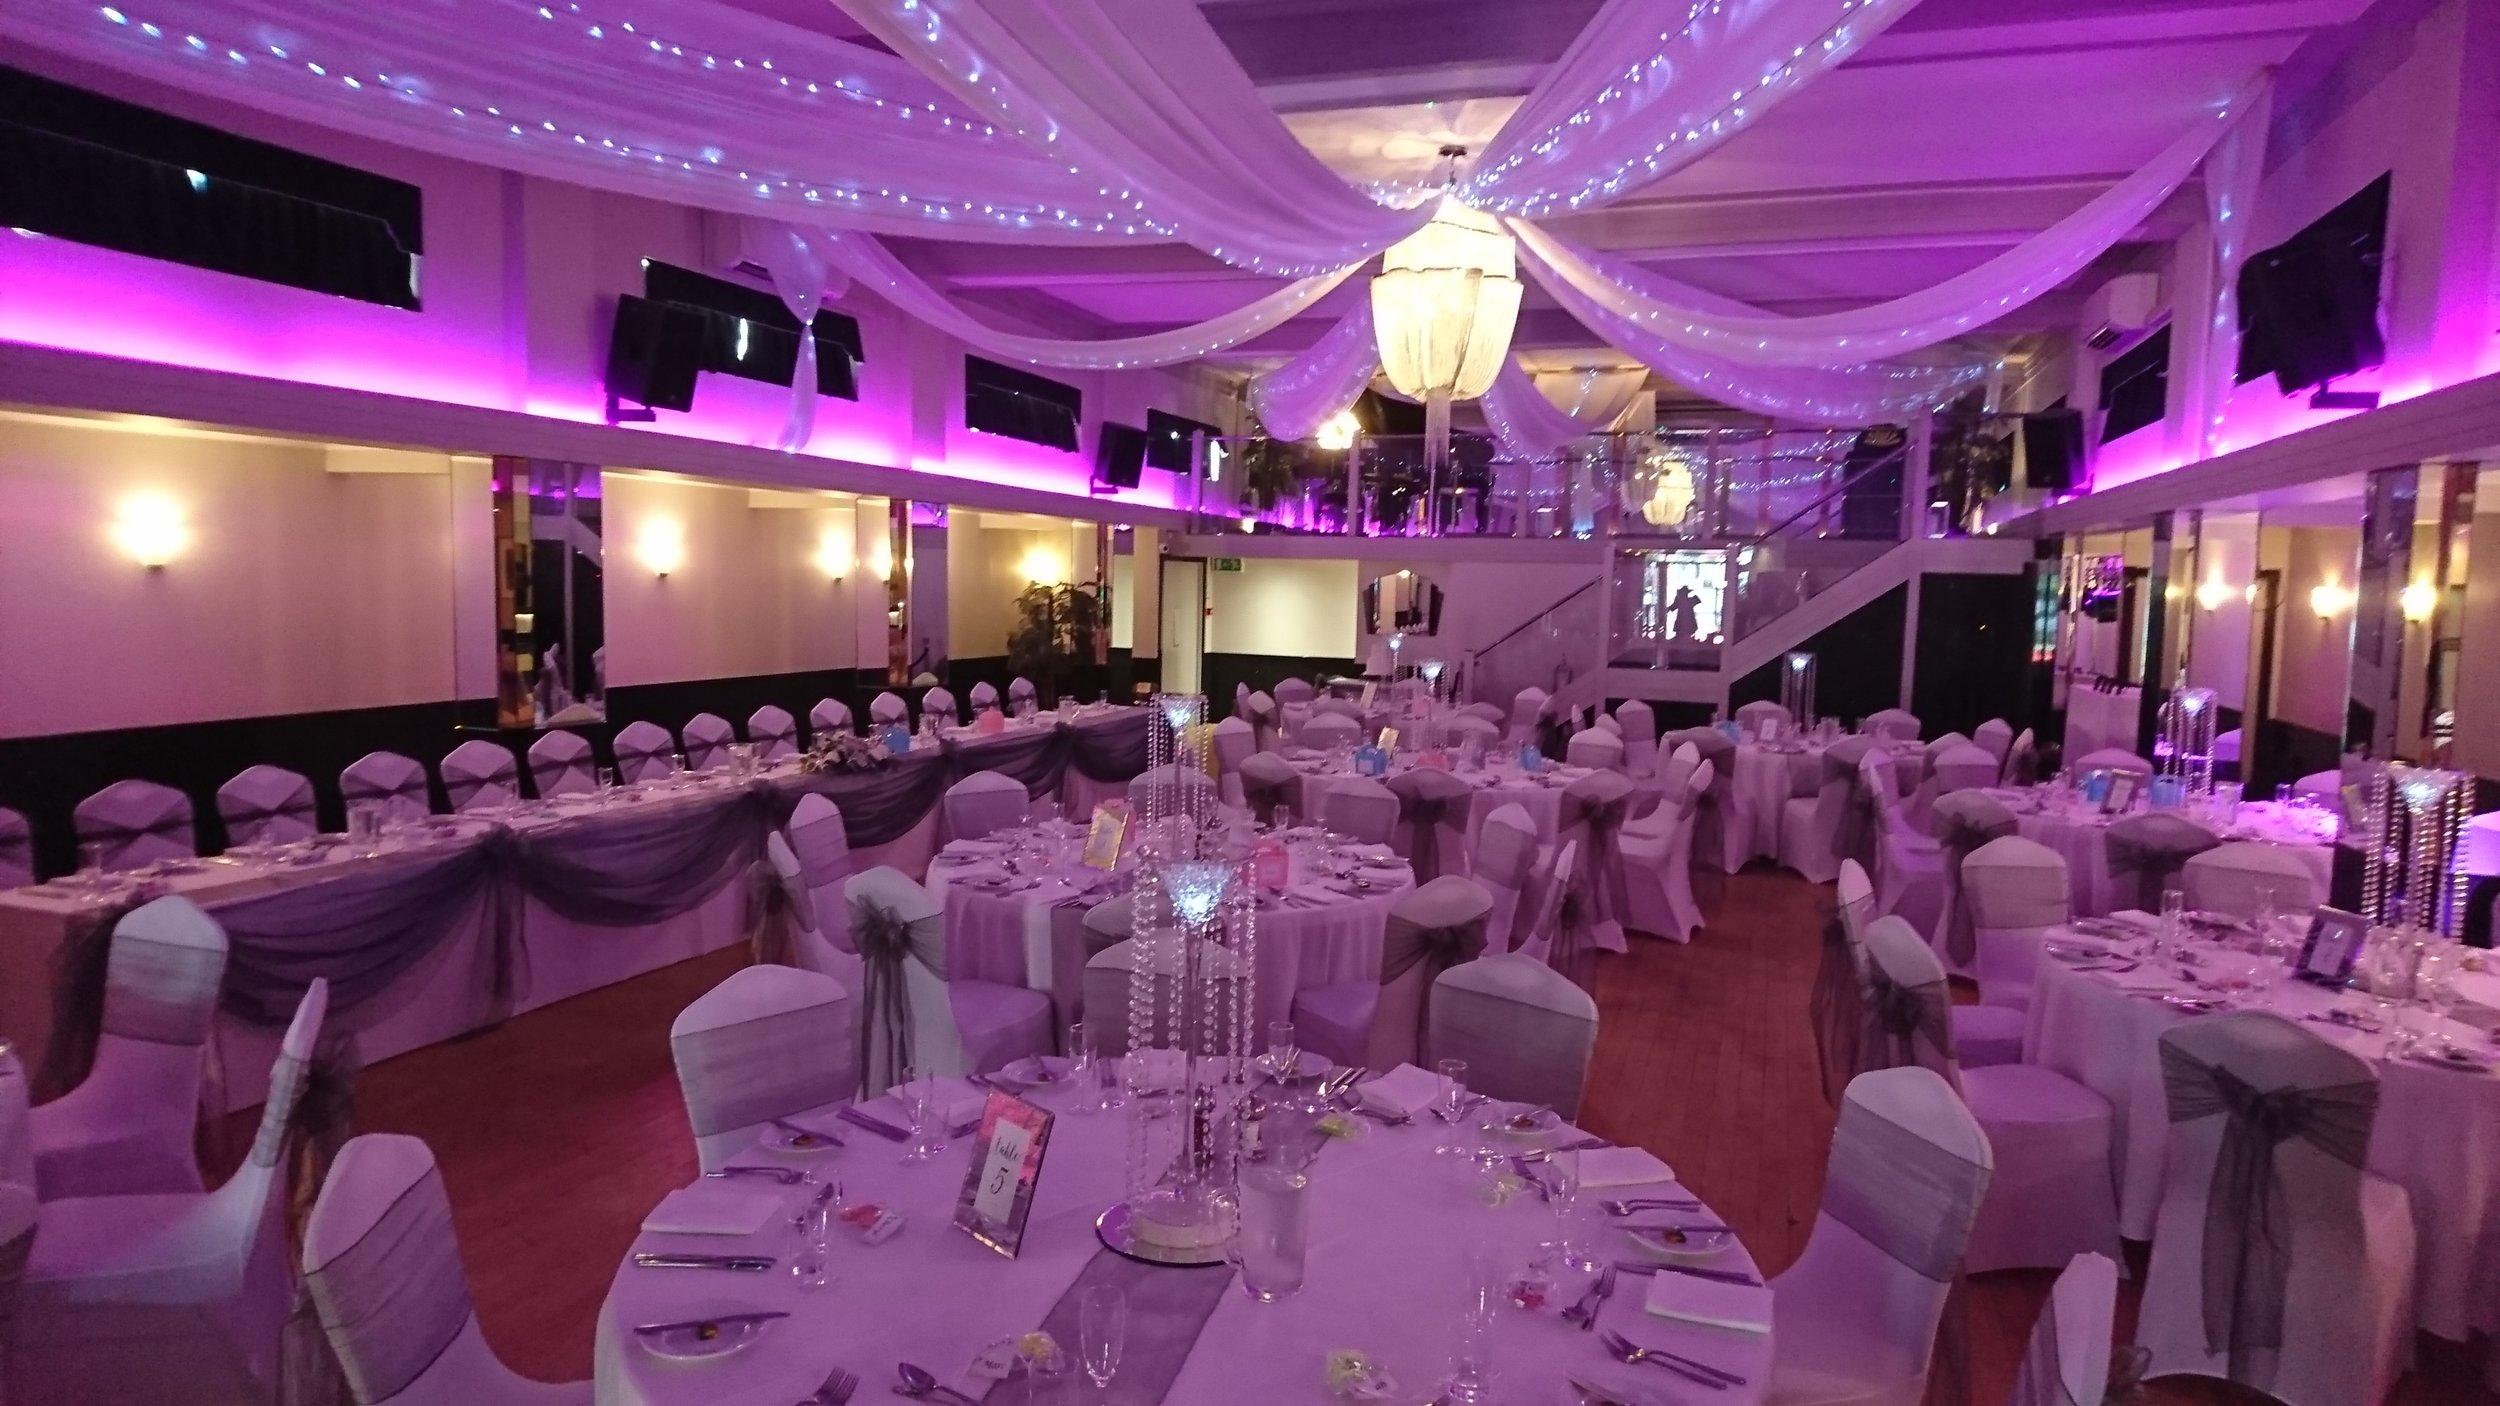 Pink Wedding - Rosie and Daniel - August 2019 - The Arlington Ballroom Essex